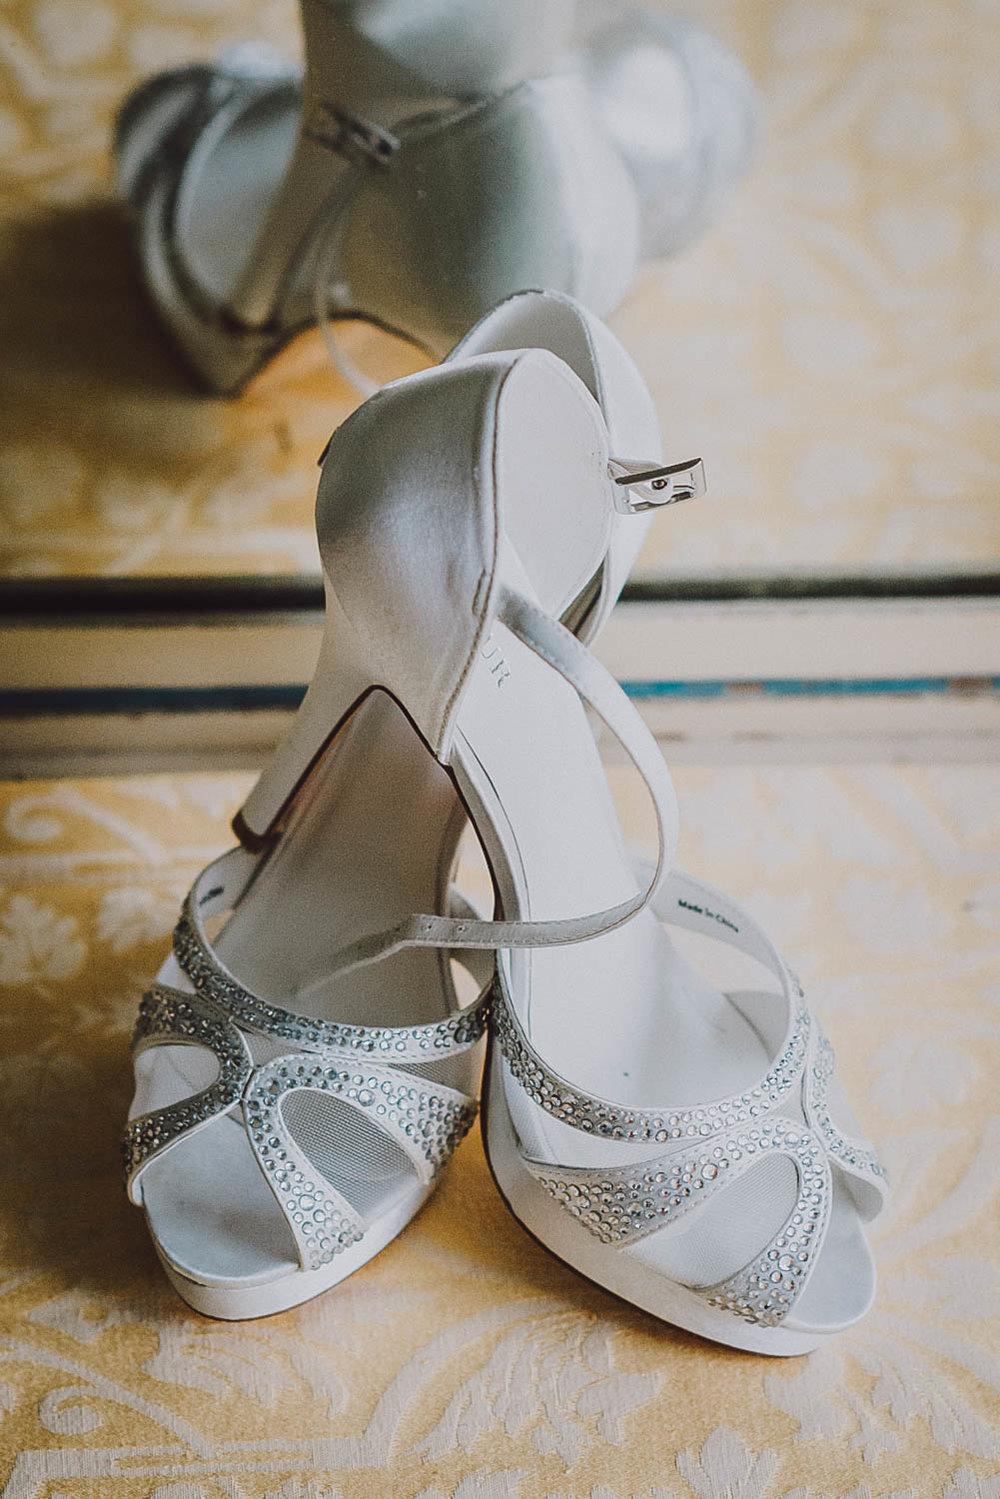 ecaterina-chandu-dondeti-wedding-photography1.jpg